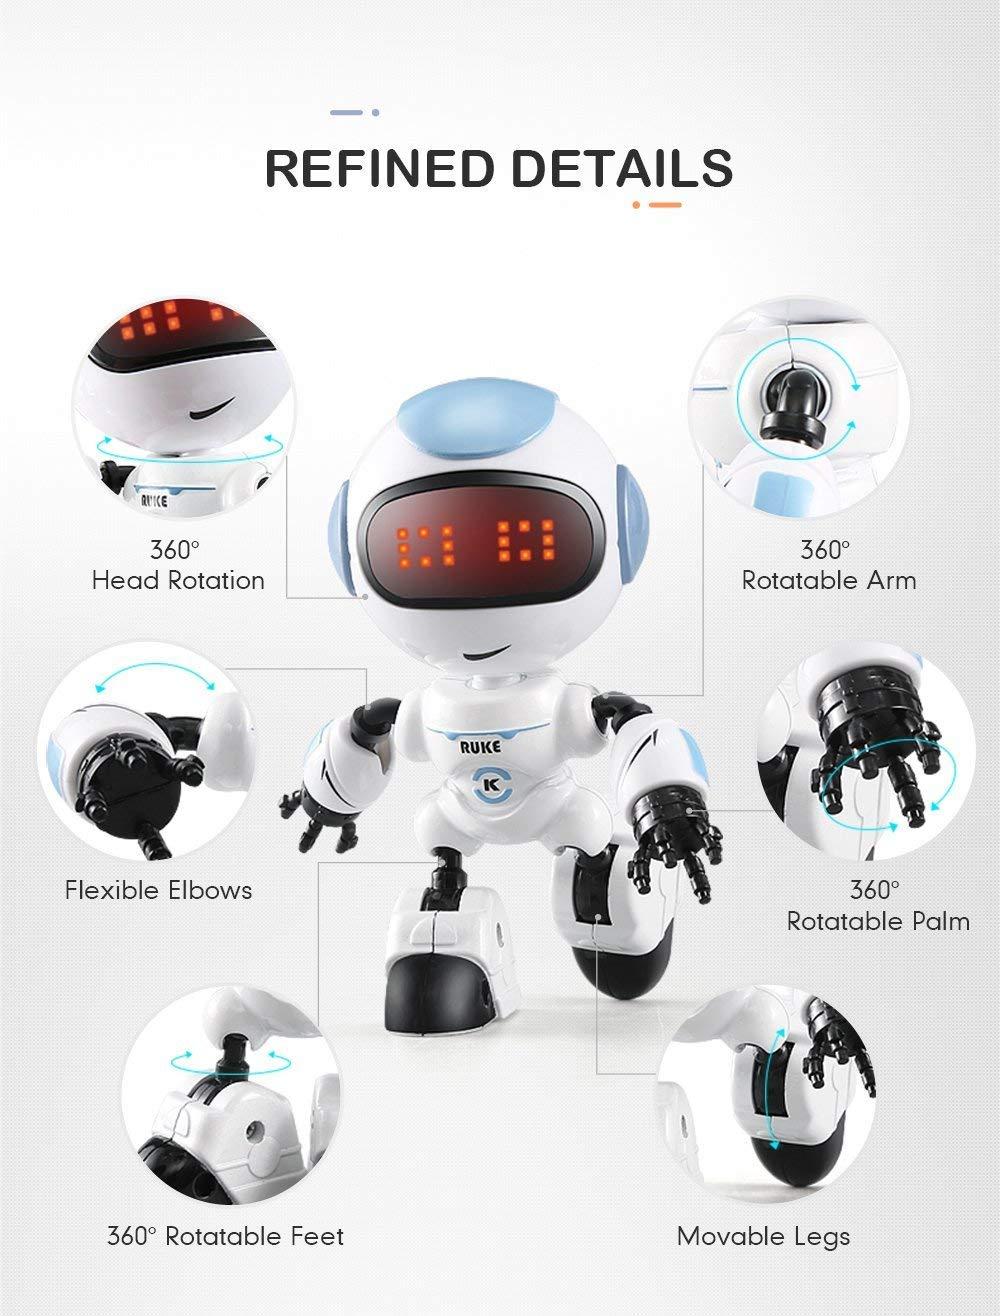 JJRC R8 LUKE Intelligent Robot Touch Control DIY Gesture Talk Smart Mini RC Robot Gift Toy 17